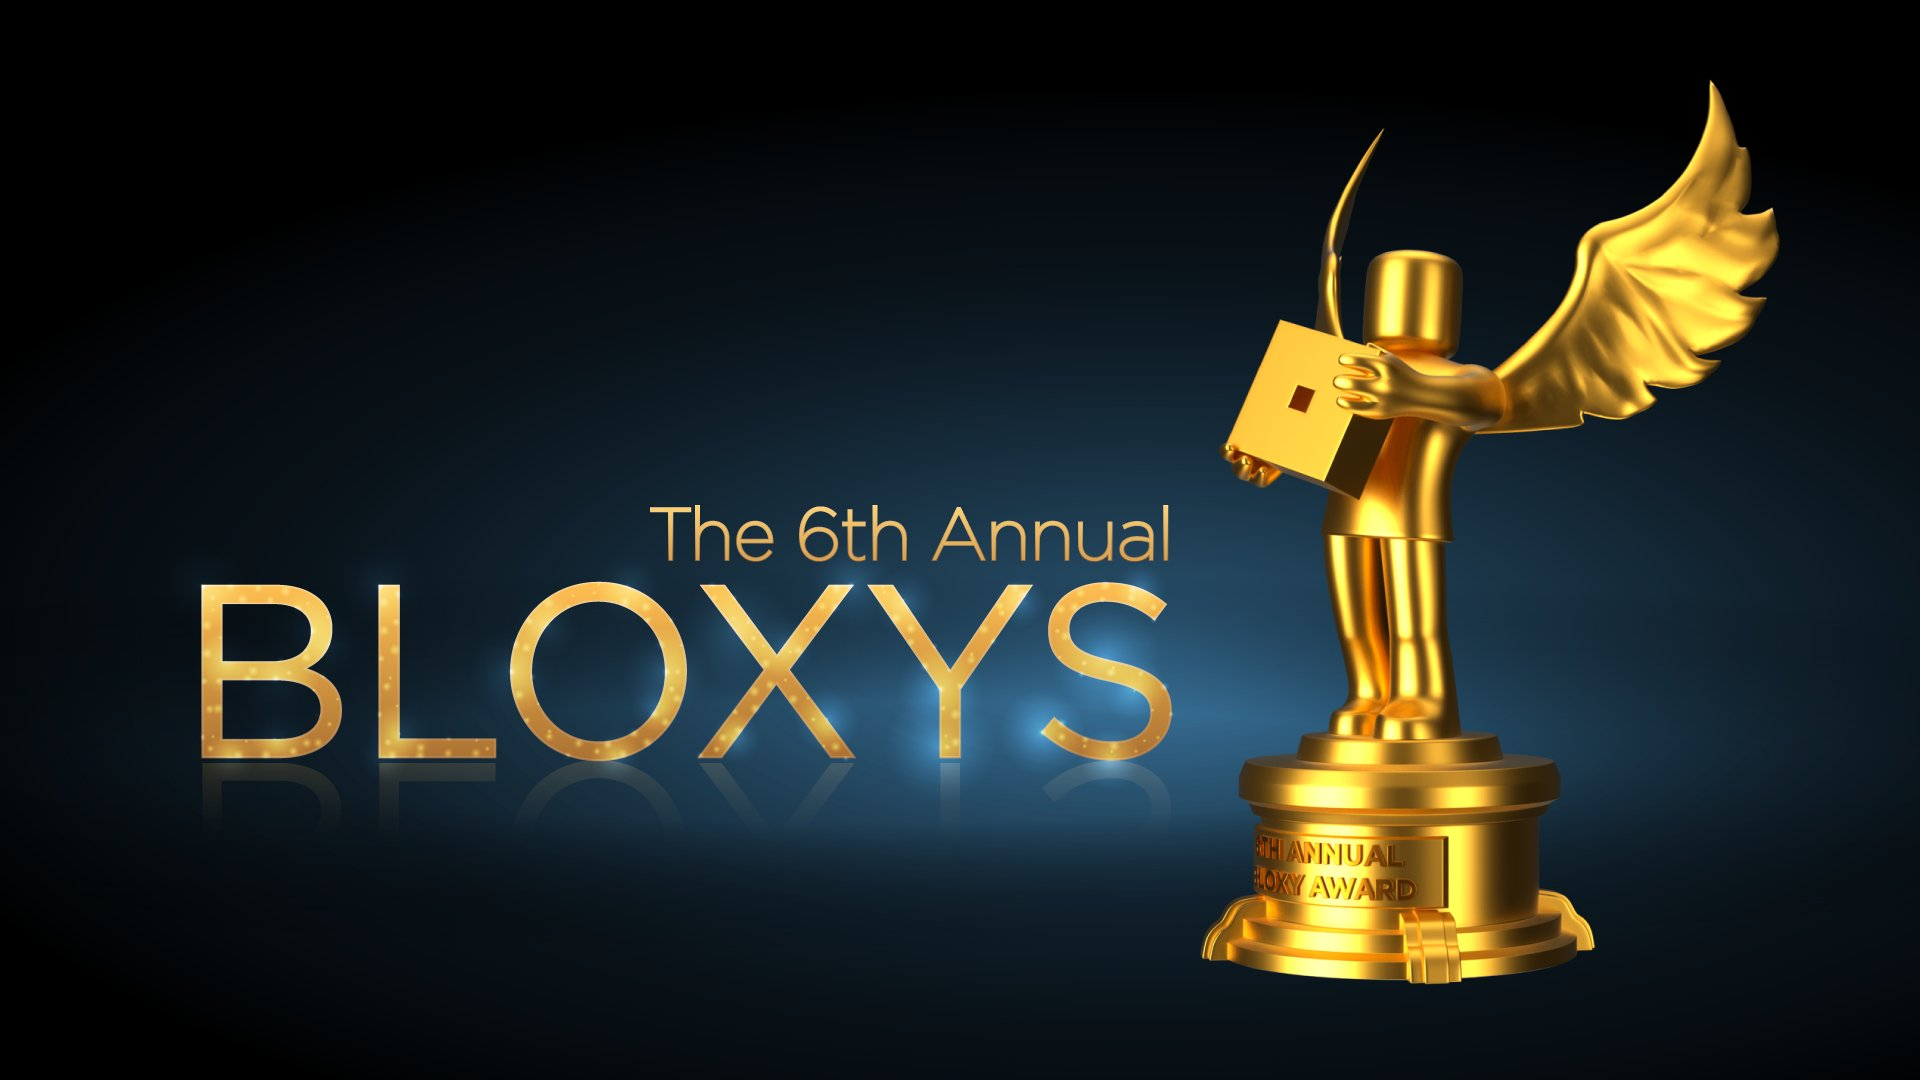 Roblox Halloween 2020 Prize Leaks 6th Annual Bloxys   Roblox Wikia   Fandom